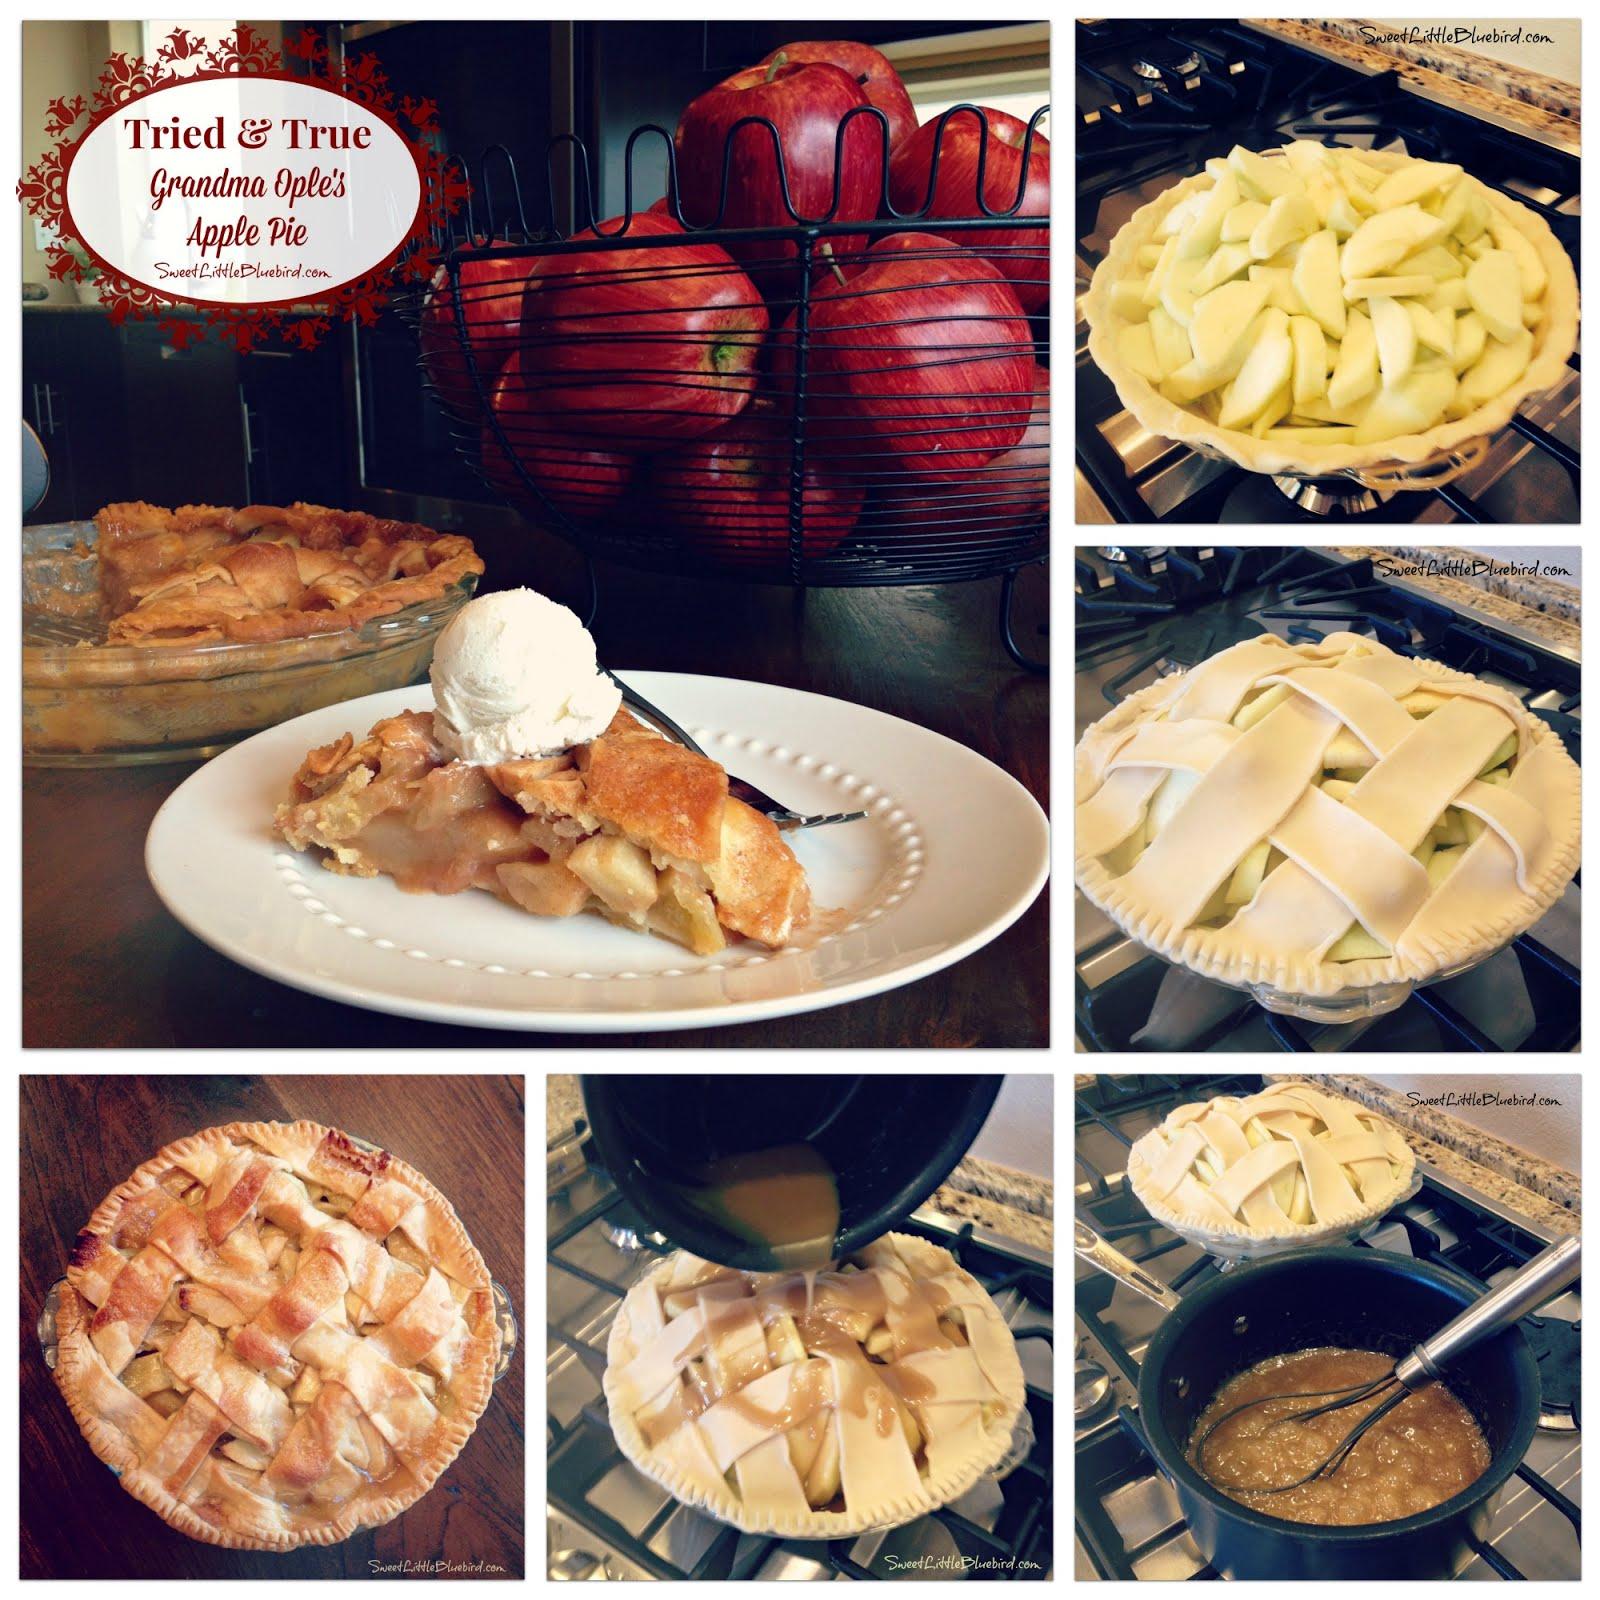 Grandma Ople's Famous Apple Pie